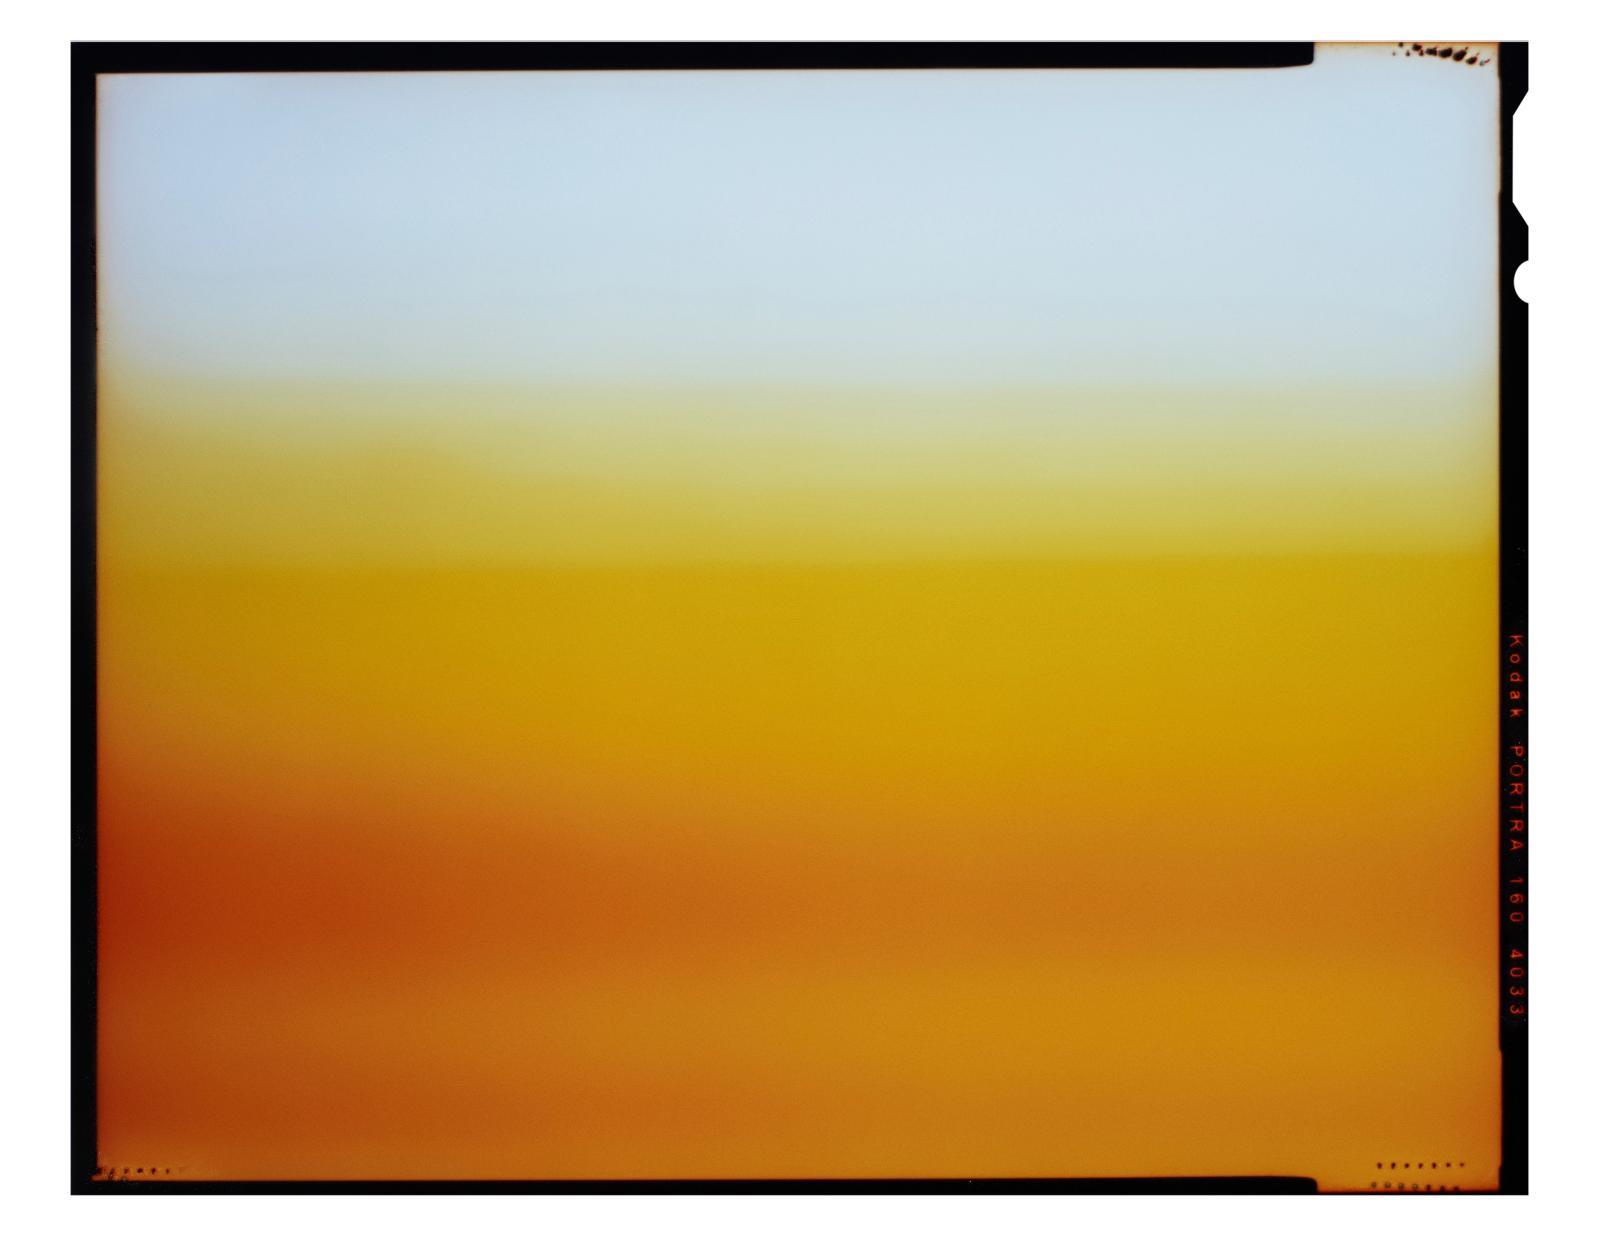 Thomas Paquet, Horizon #9, 2019, 94 x 18 cm, galerie Thierry BigaignonCOURTESY GALERIE THIERRY BIGAIGNON